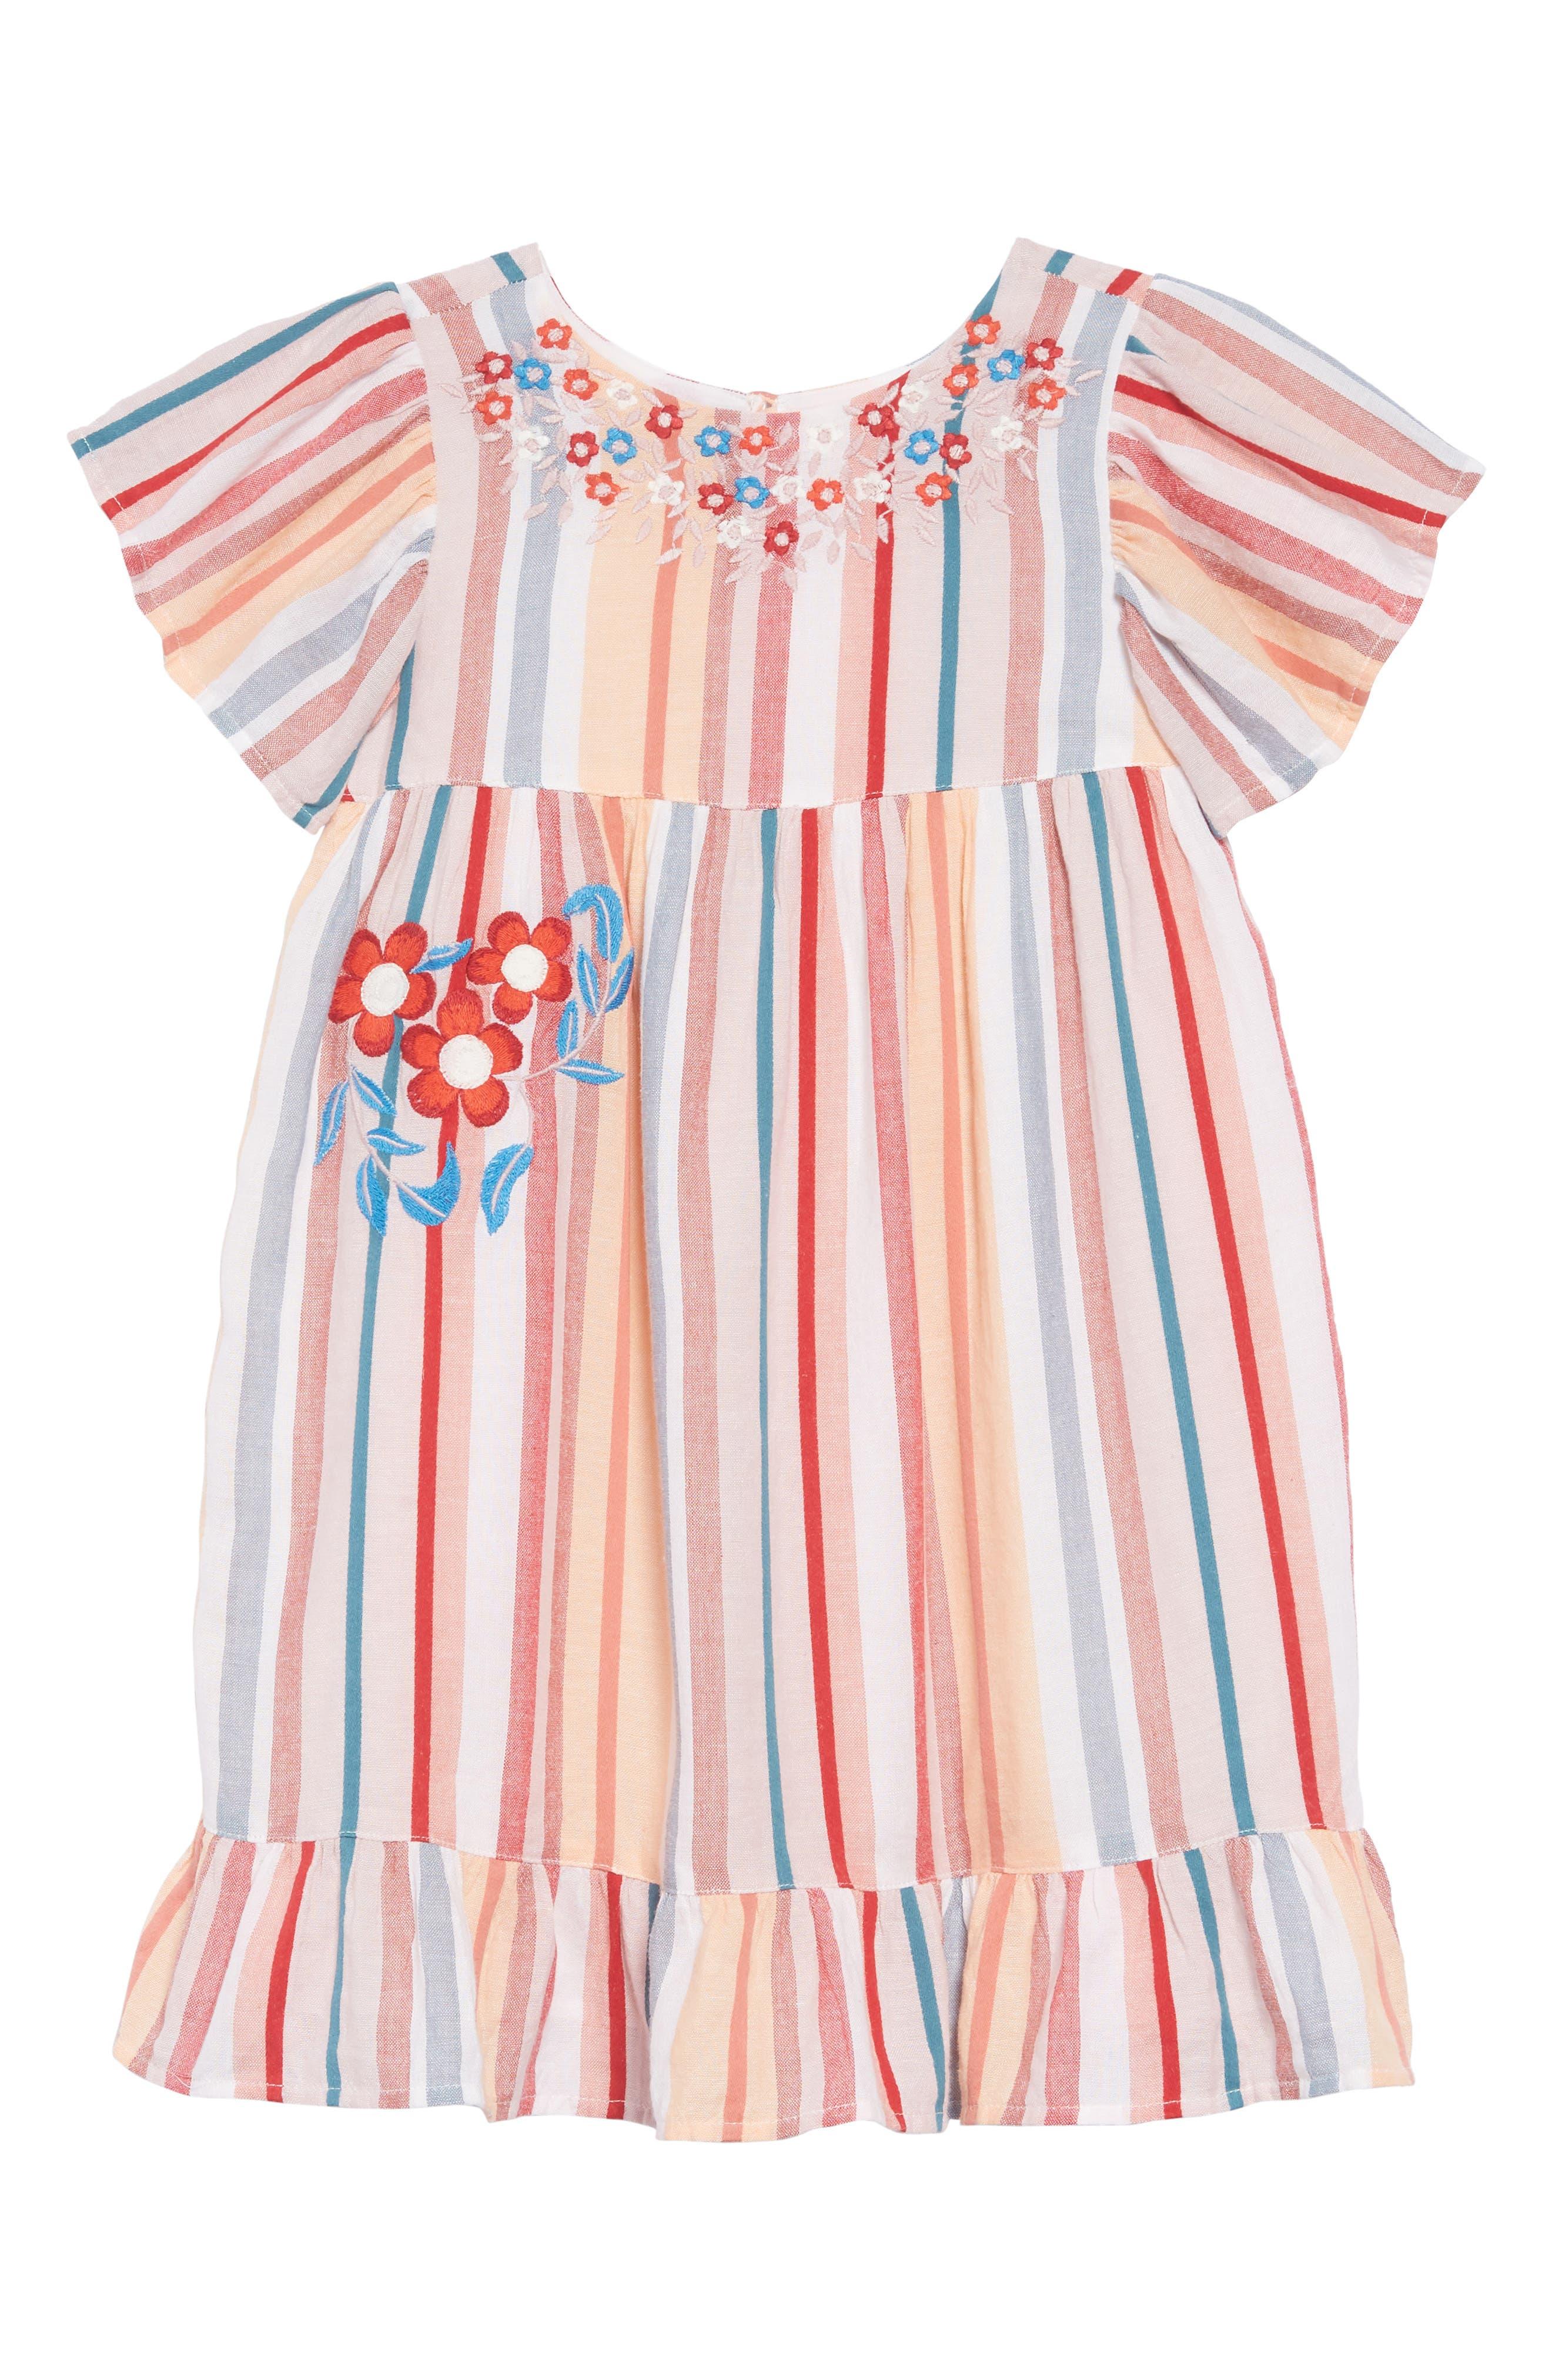 Embroidered Stripe Dress,                         Main,                         color, IVORY EGRET MULTI STRIPE